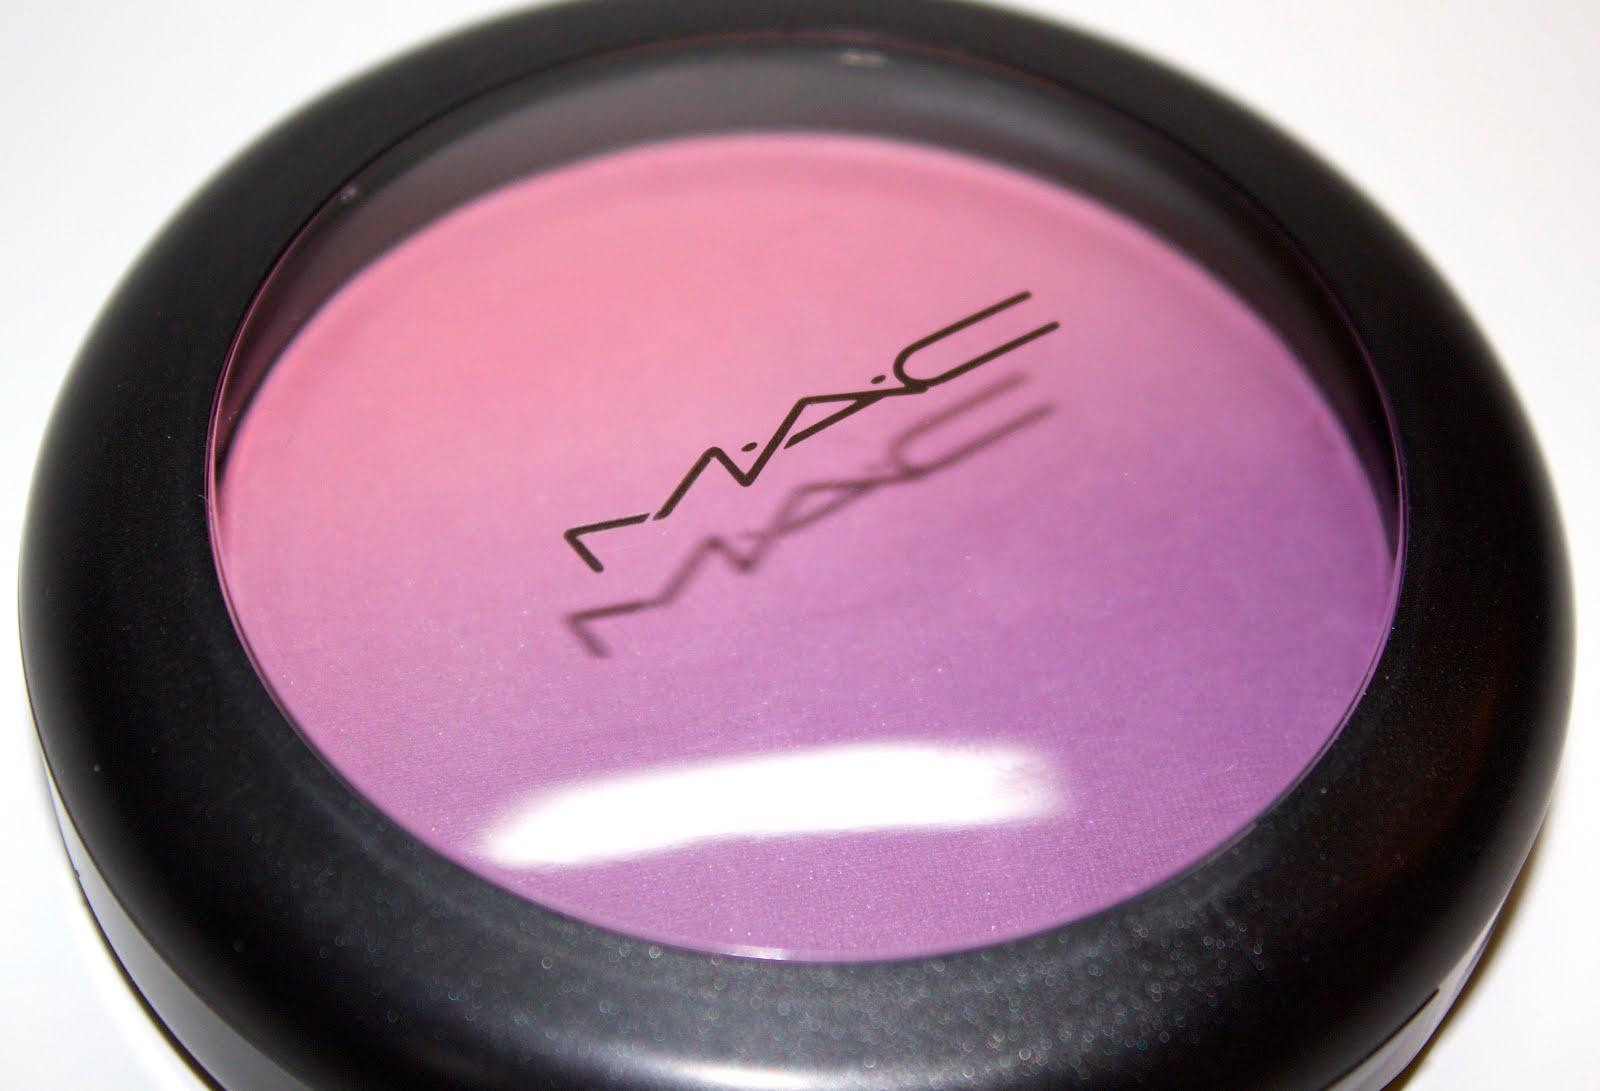 mac azalea blossom blush - photo #30